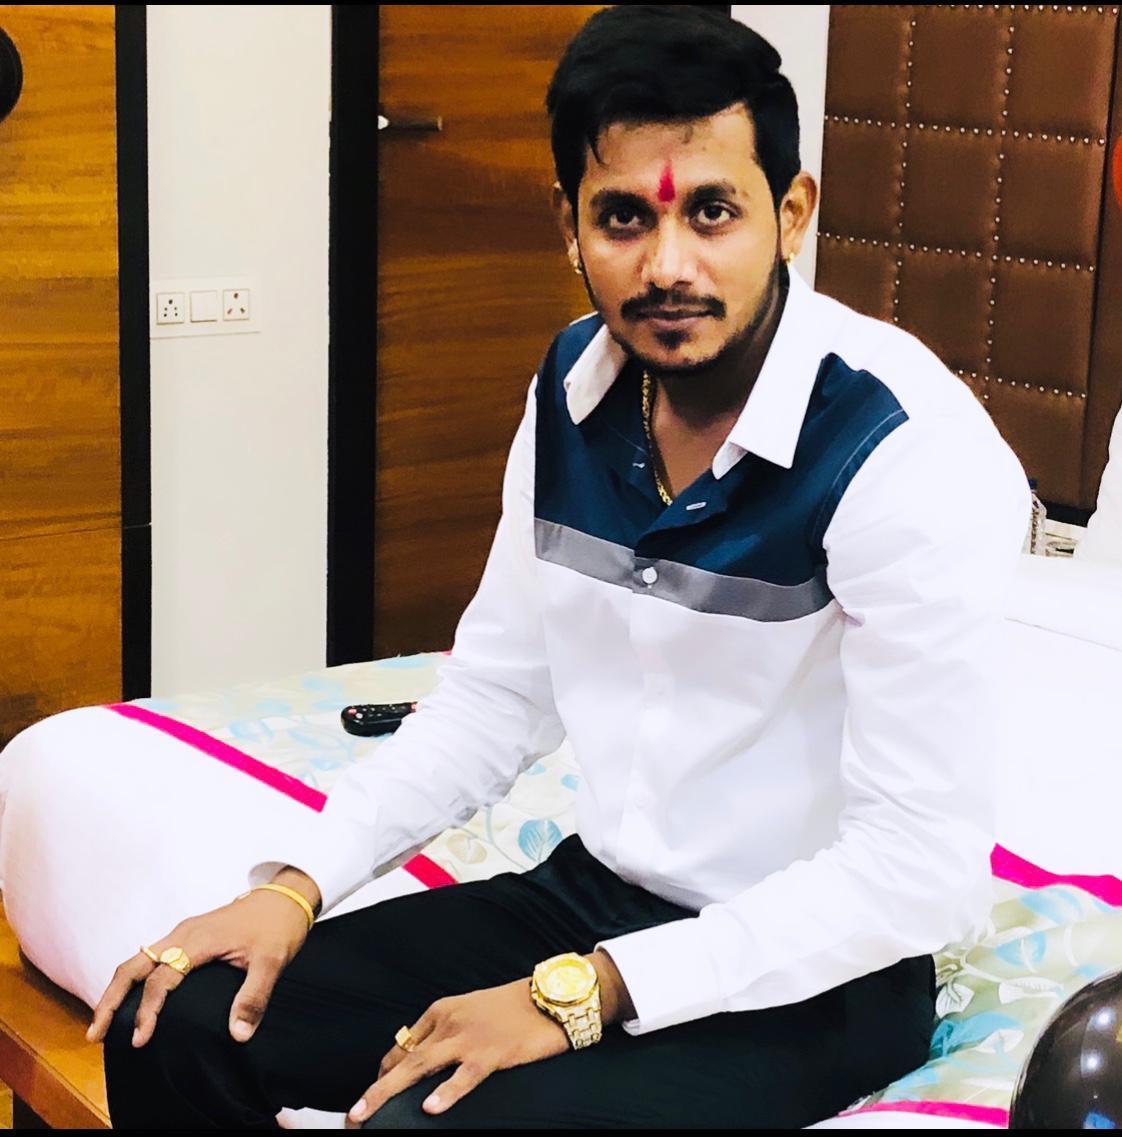 Himanshu patel a rising star of Indore